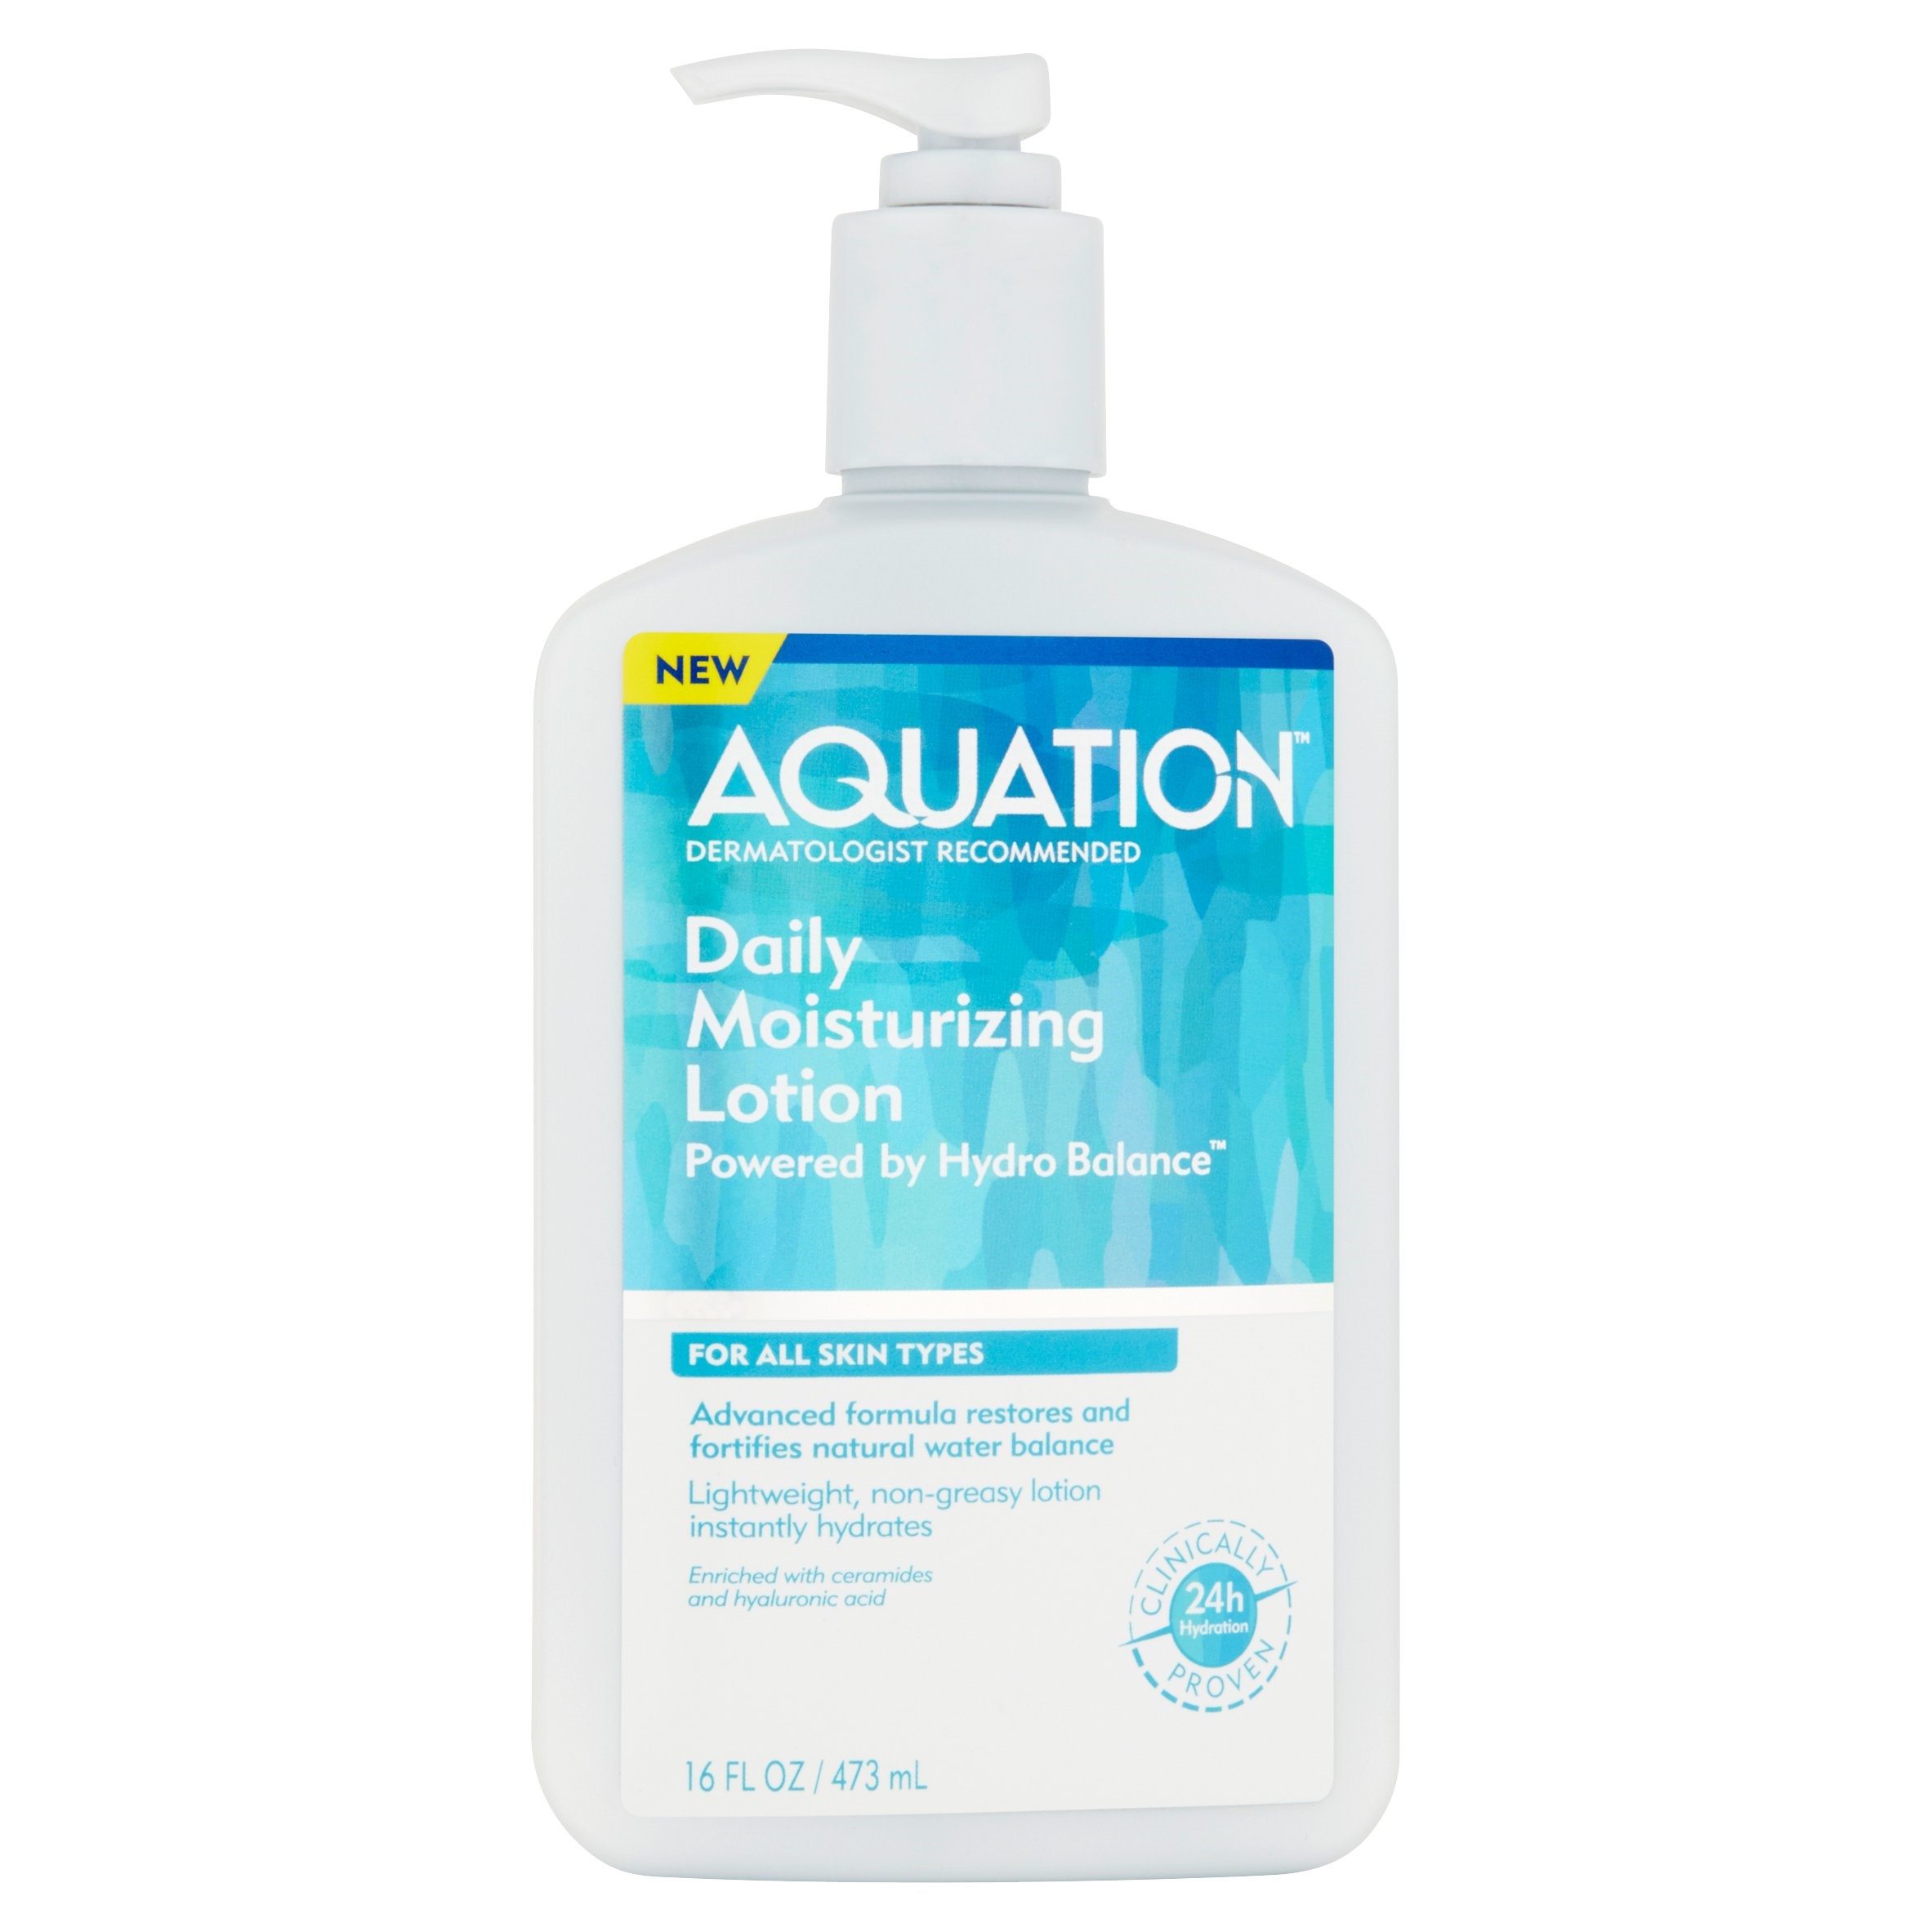 Aquation Daily Moisturizing Lotion, 16 fl oz